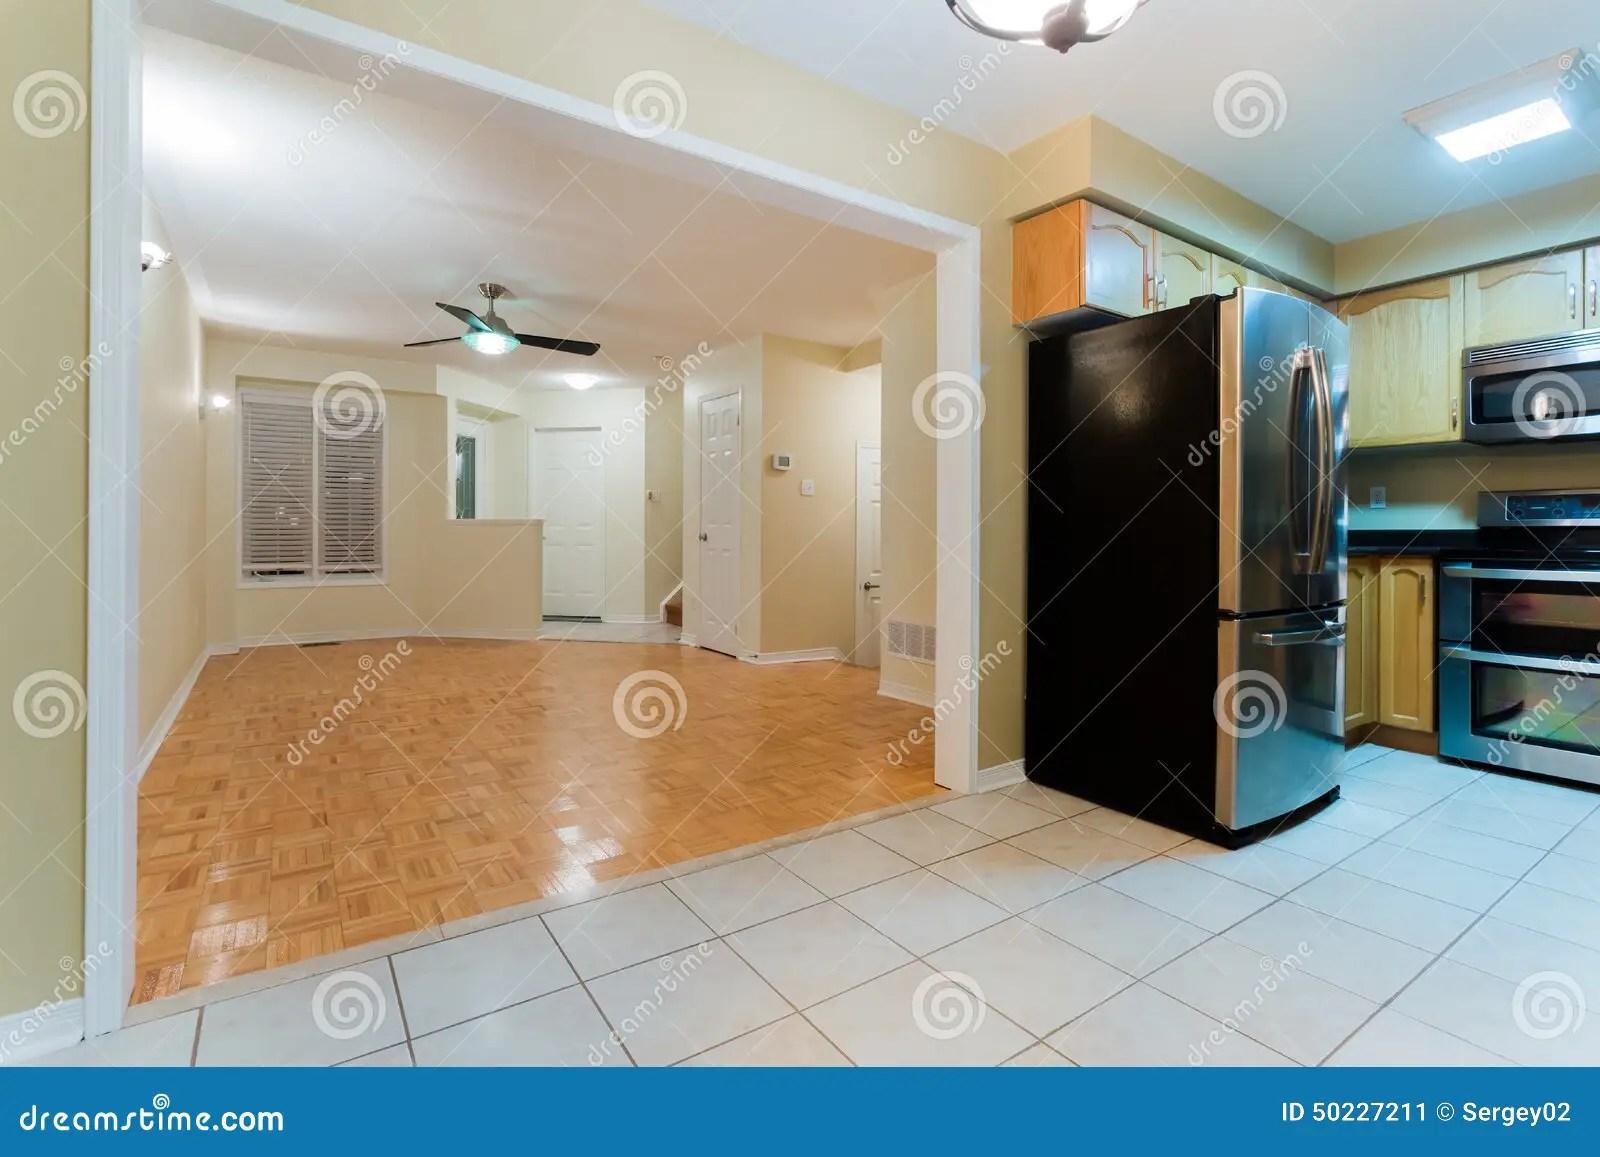 empty living room kitchen stock photo image design room interior design kitchen interior design home design